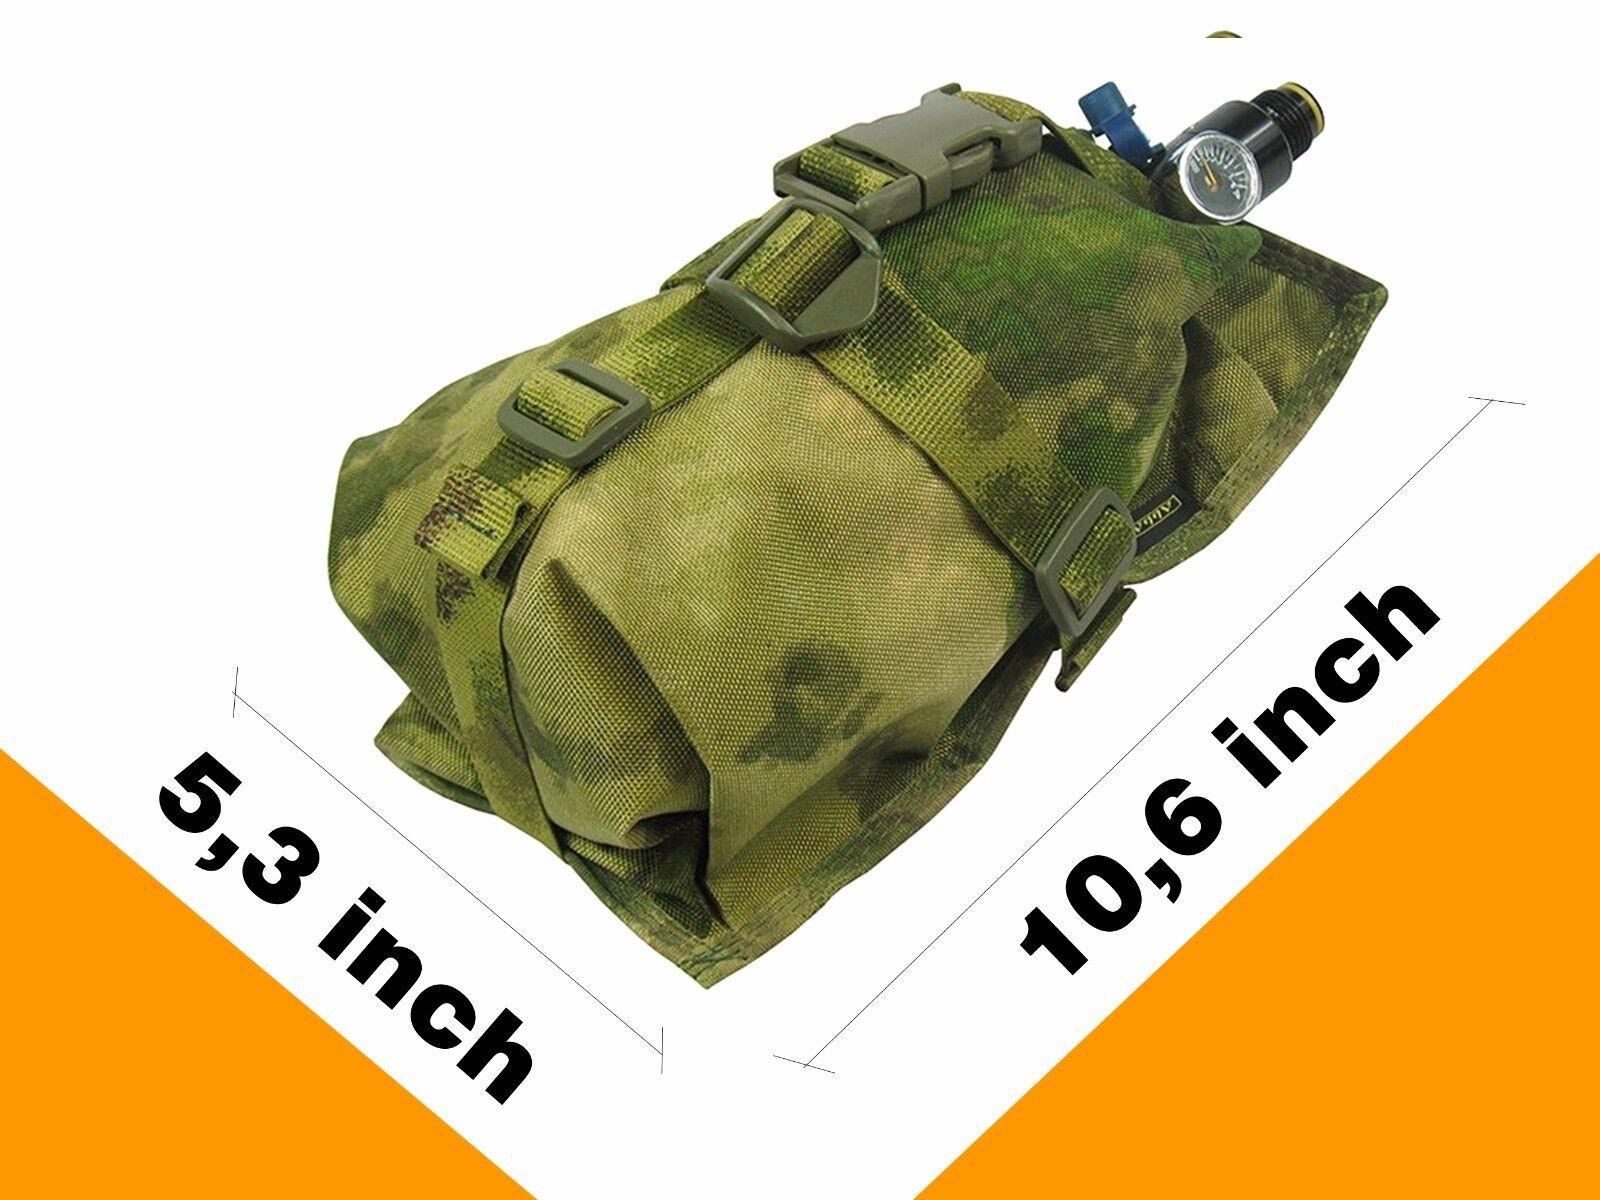 Pouch Case molle pals MULTICAM Ninja Air Tank atacs fg PAINTBALL bag waterproof